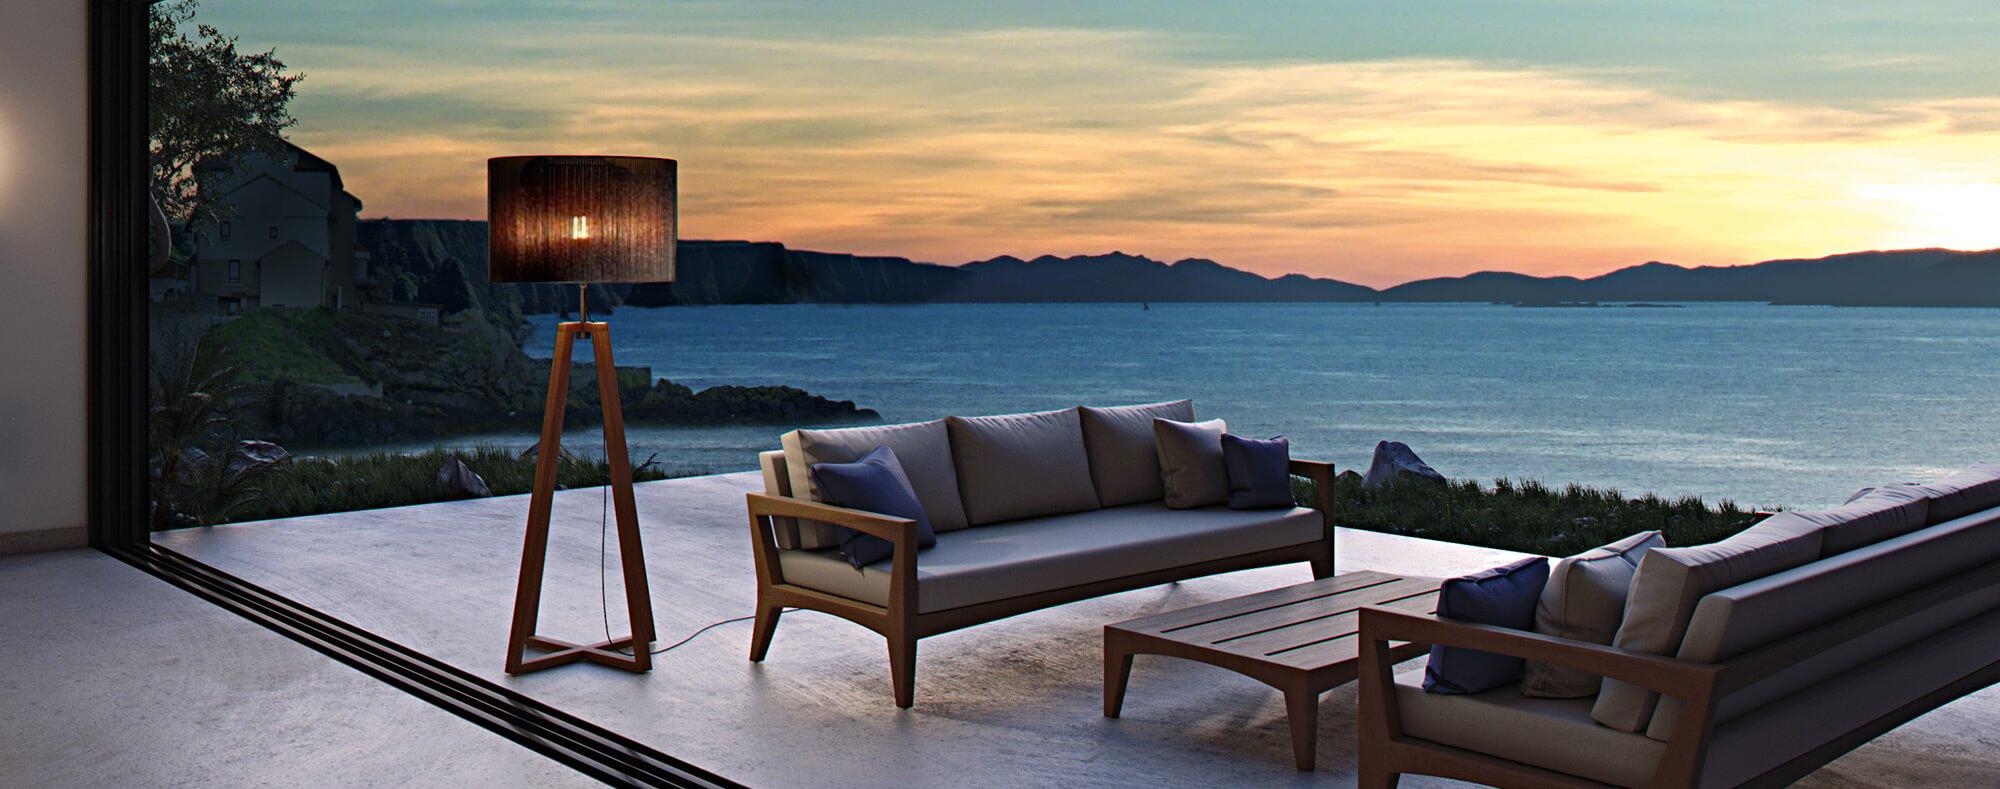 Luxury outdoor sofa set by the ocean